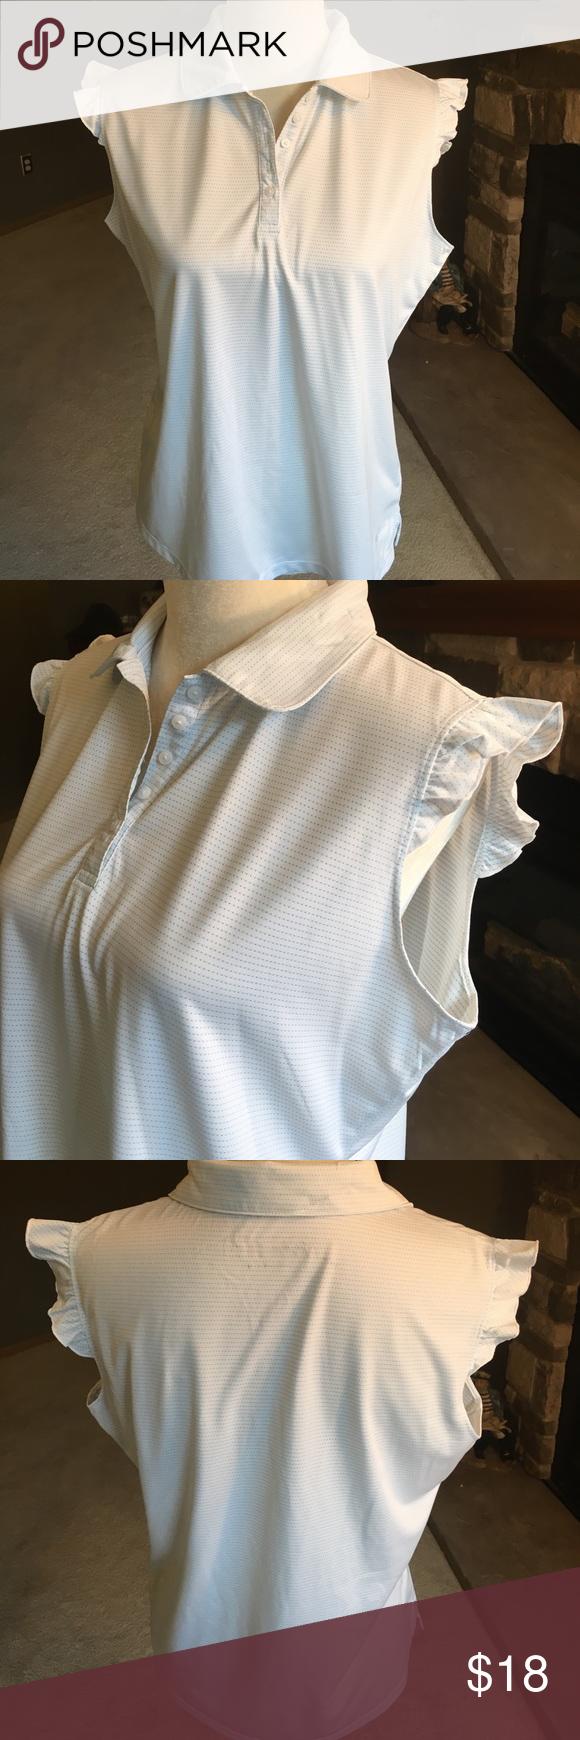 21edfffba06f2d Lady Hagen Sleeveless Golf Shirts - Cotswold Hire